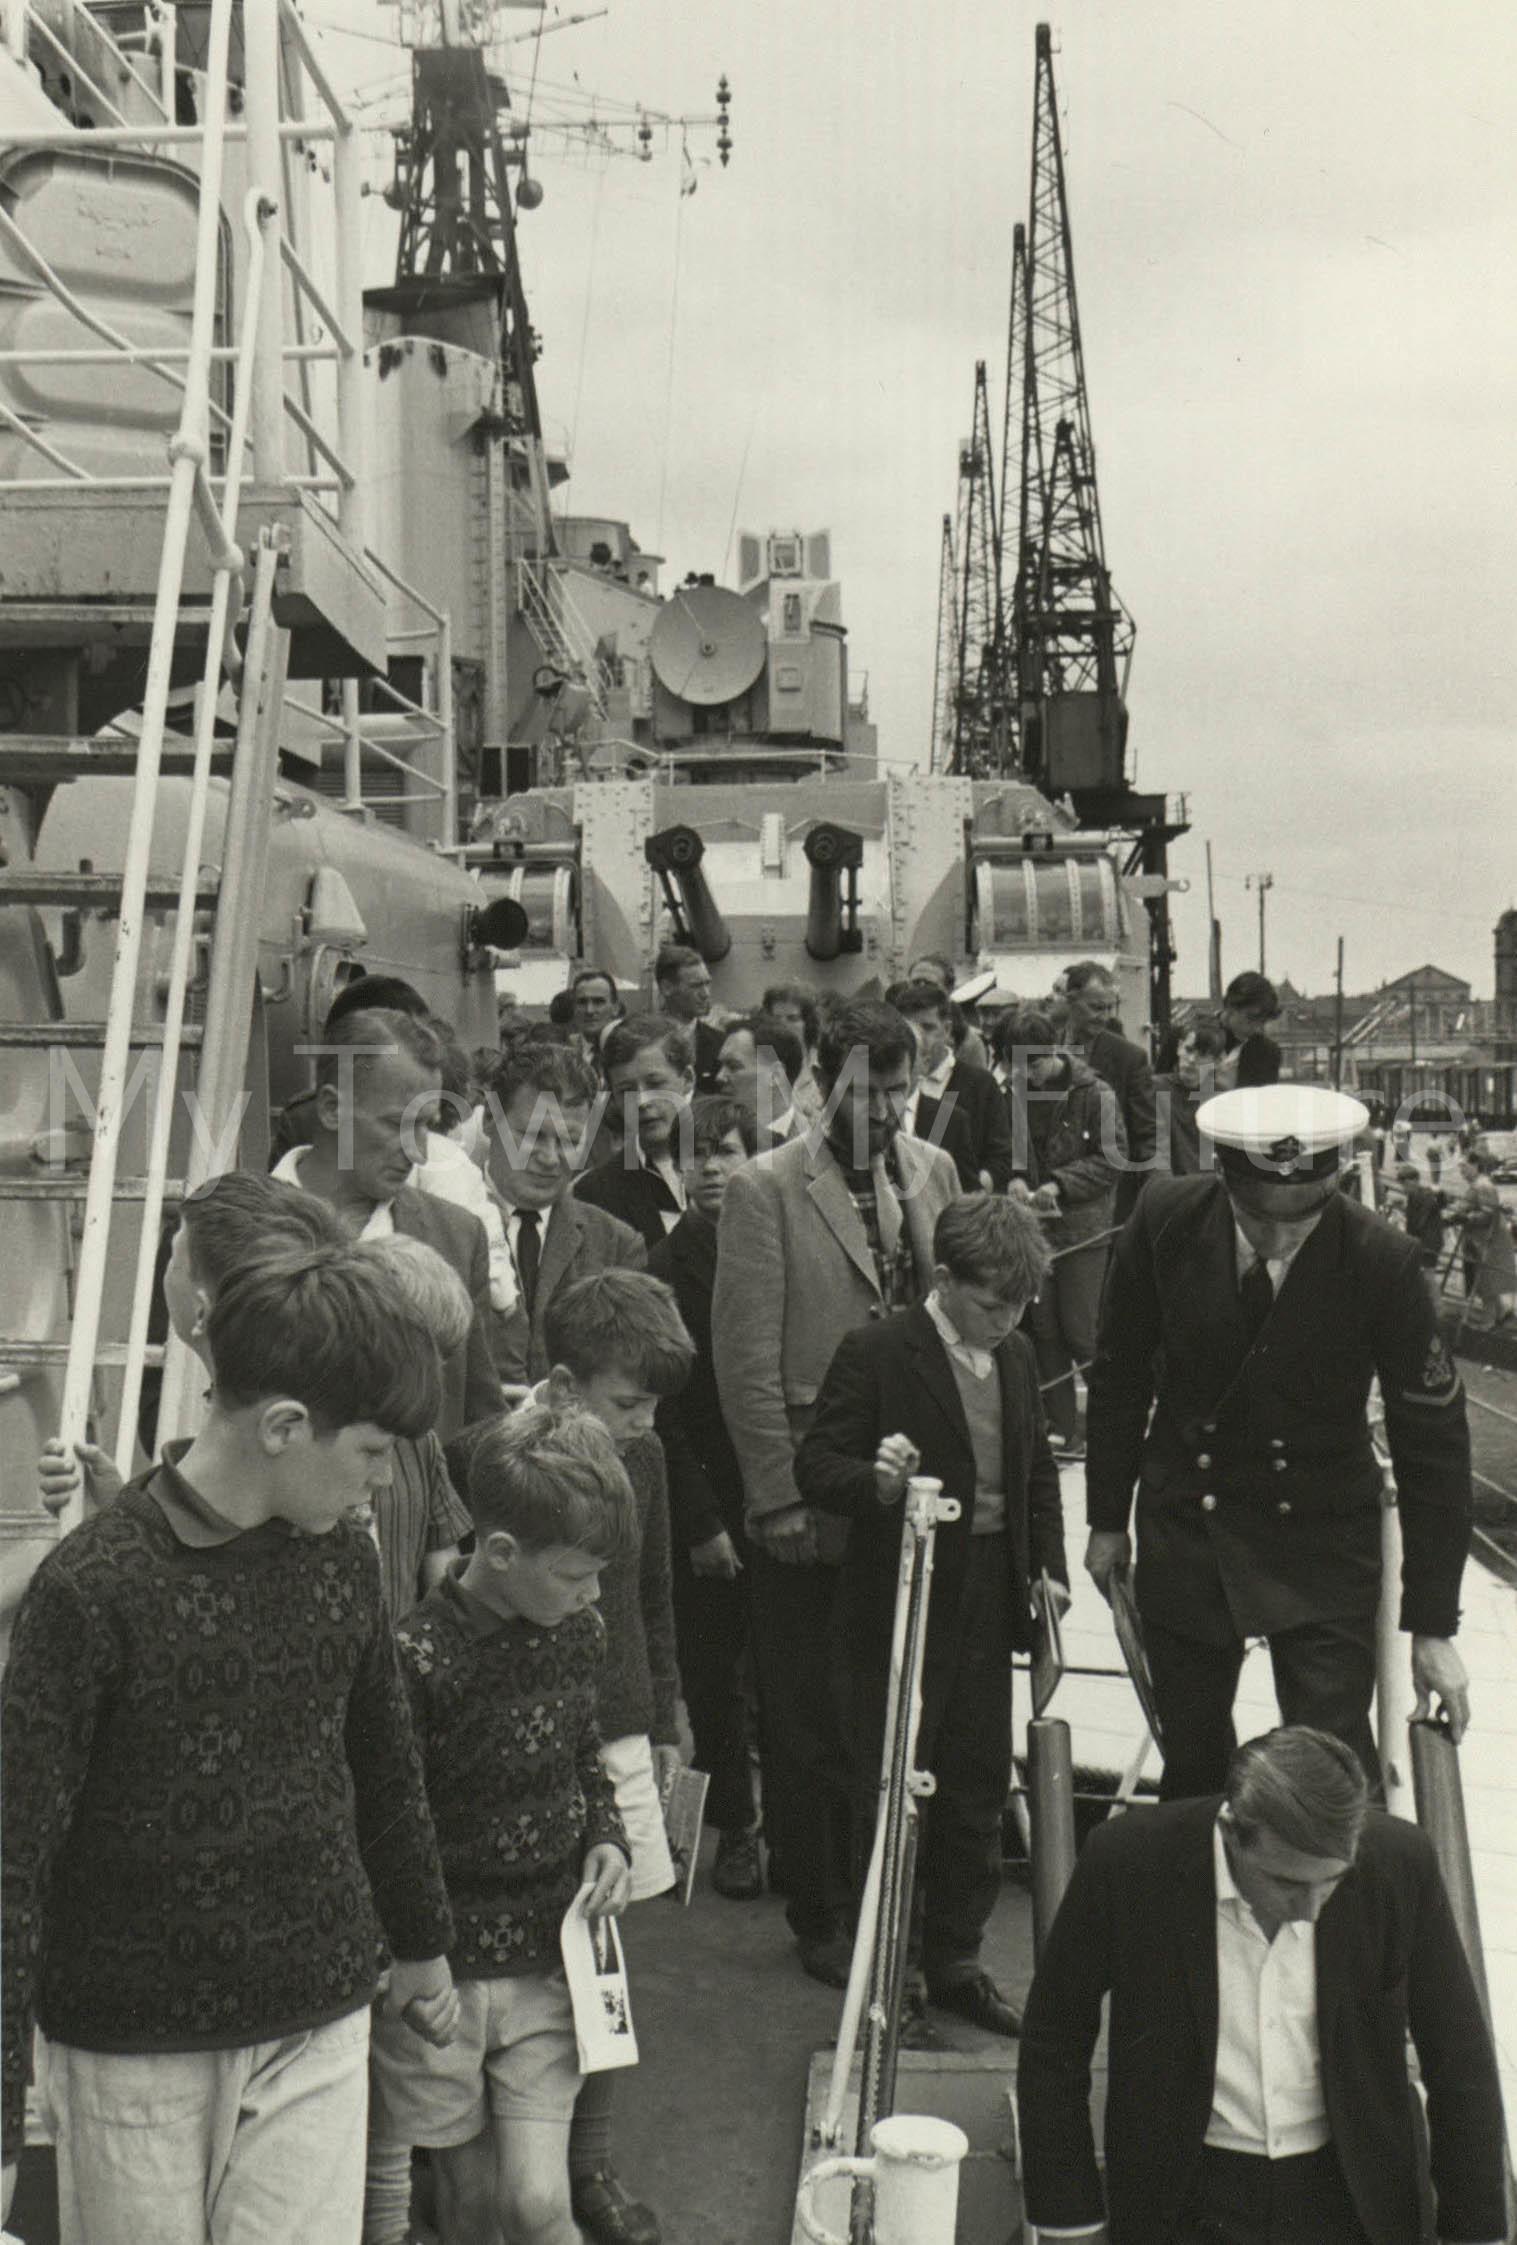 War Ships - HMS Tiger - Starboard Side looking forward